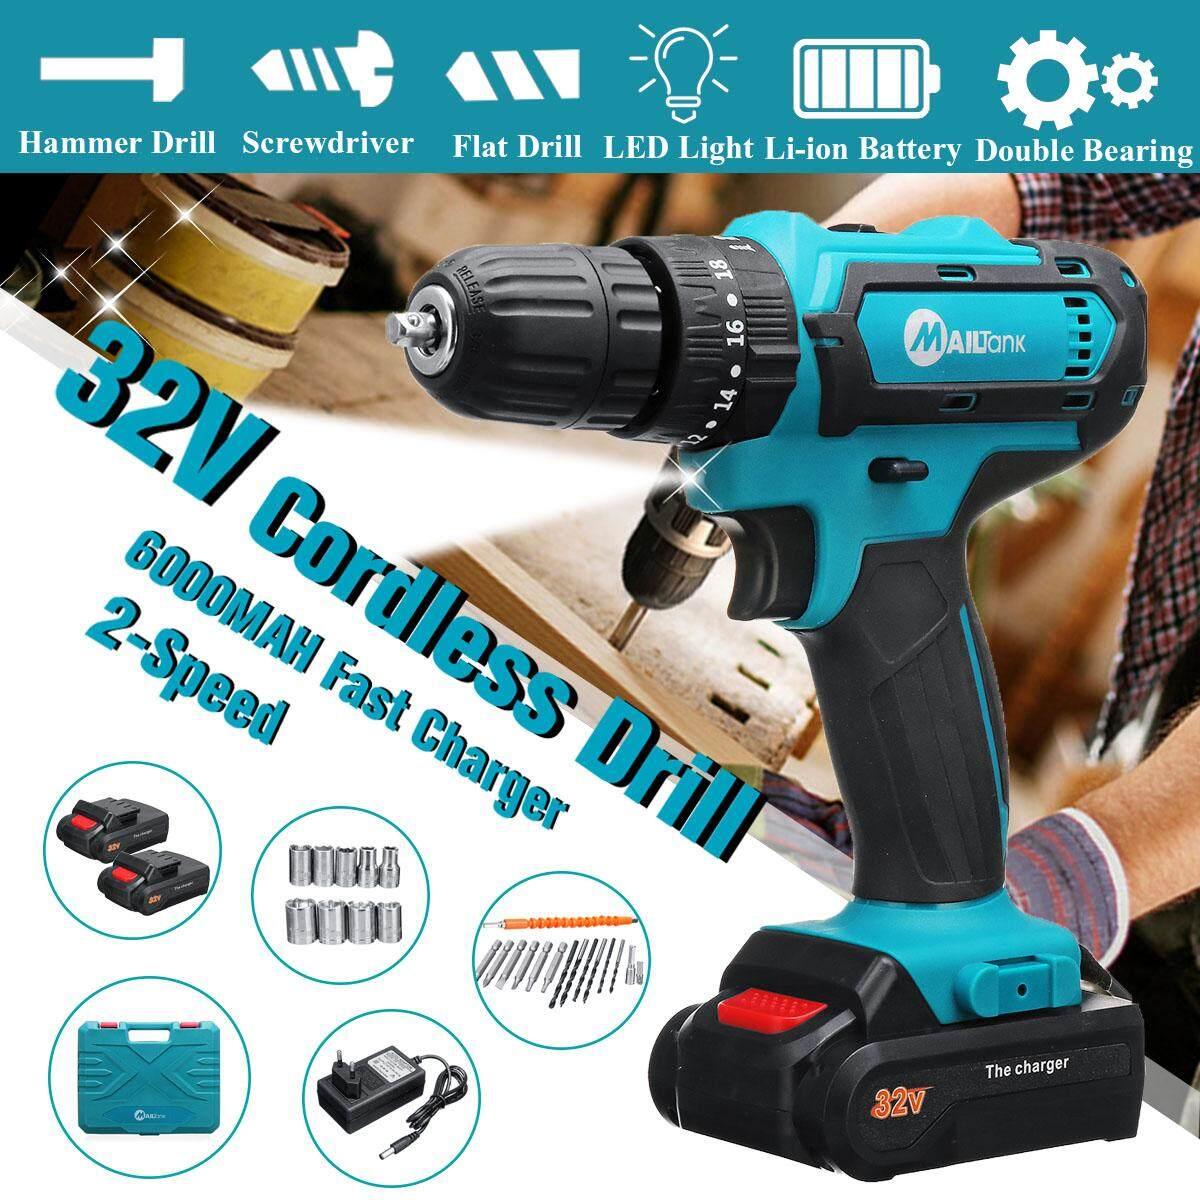 32V 2-Speed 6000mah Electric Cordless Drill 3IN1 Screwdriver 2 Li-Ion Batteries